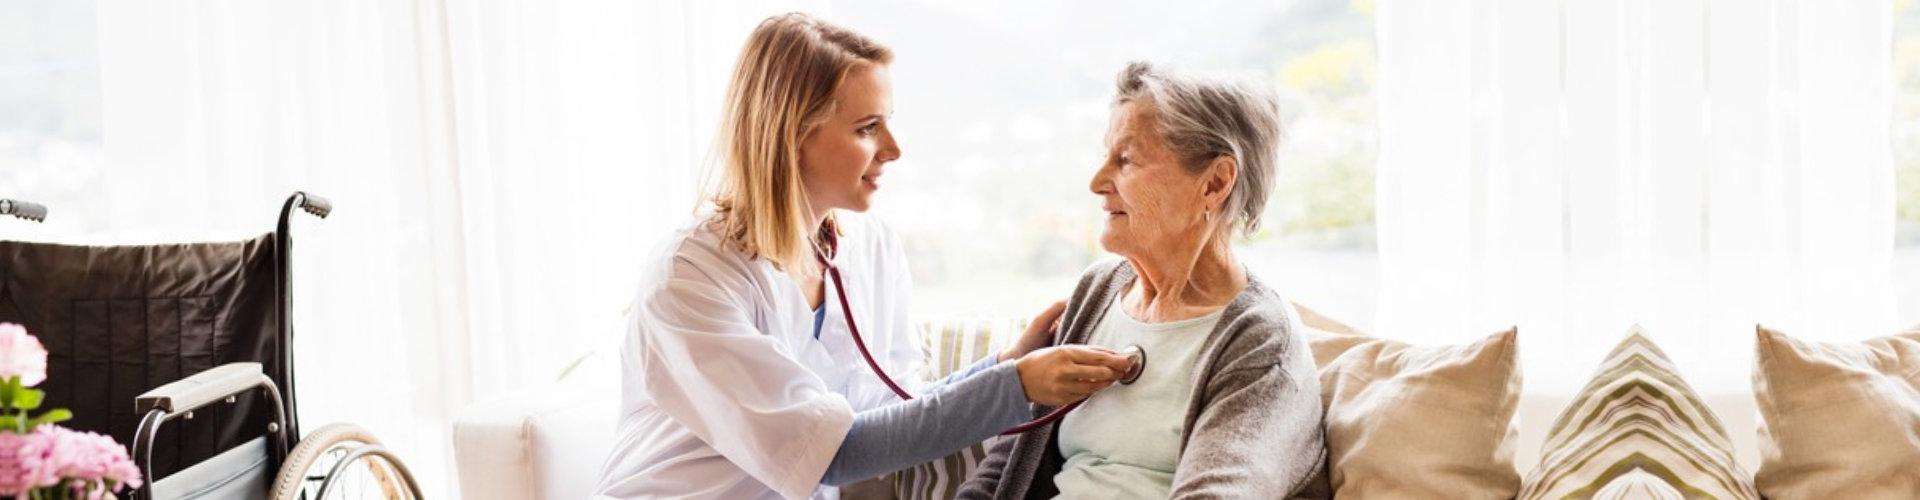 a woman checking heartbeat of an elderly woman